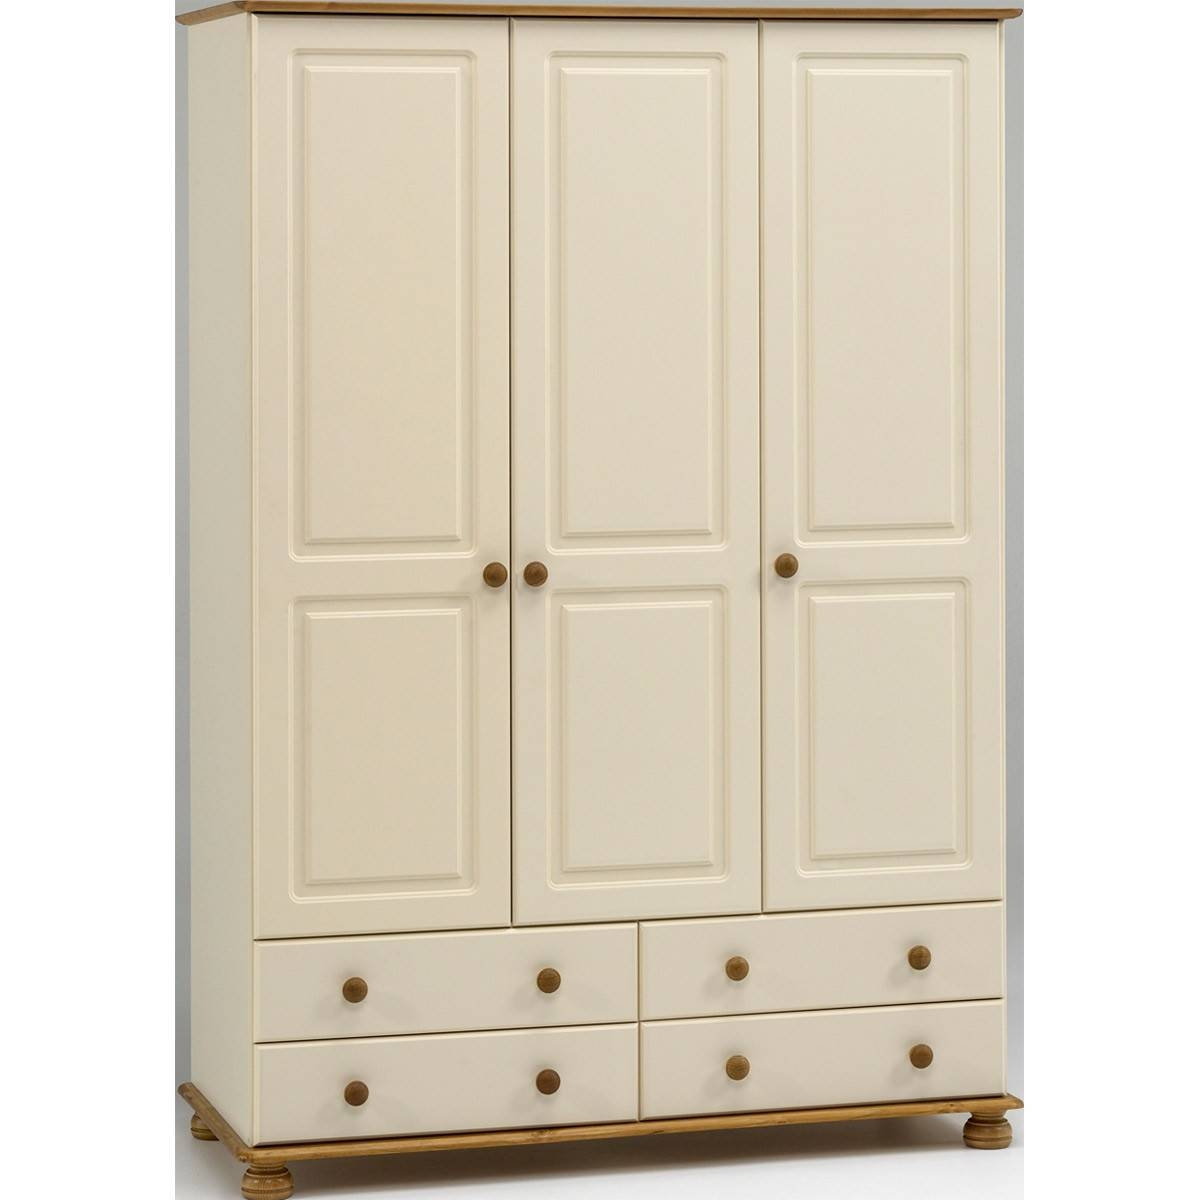 Salisbury Cream And Pine 3 Door 4 Drawer Wardrobe From The pertaining to Pine Wardrobes (Image 15 of 15)